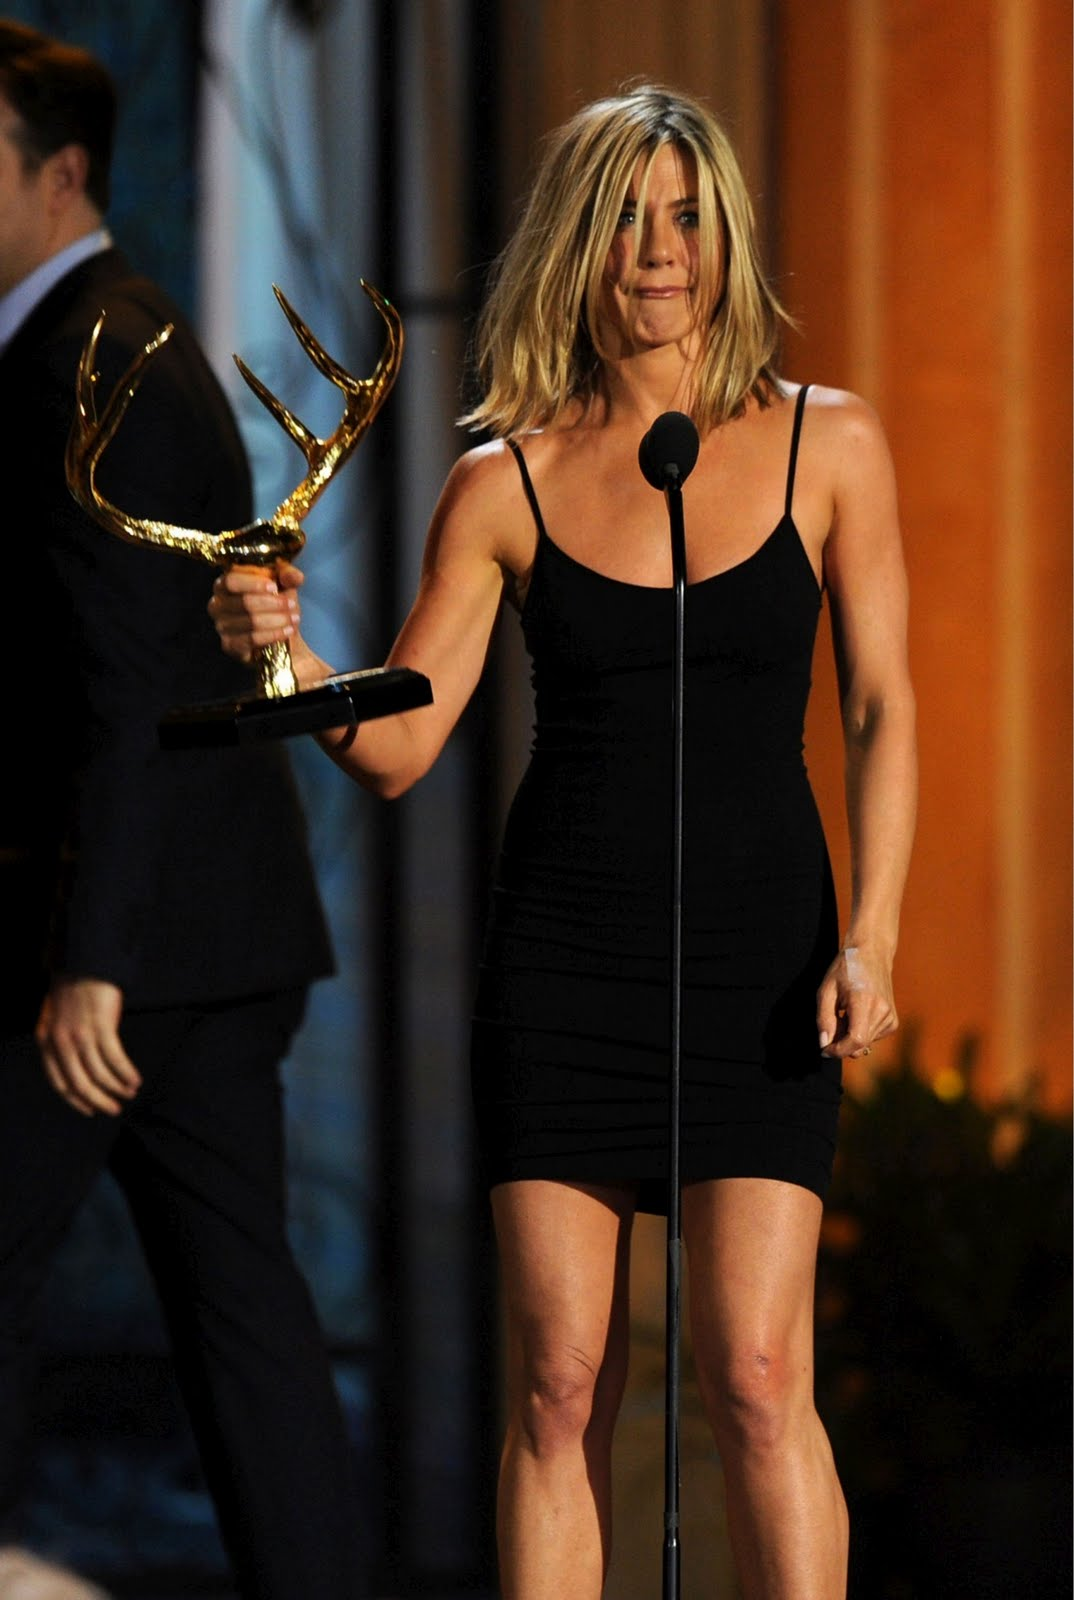 http://2.bp.blogspot.com/-esi61y5eraM/Tev3T2RcfOI/AAAAAAAAA4I/0U_GZtpZvvU/s1600/Jennifer+Aniston+at+the+2011+Guys+Choice+Awards+in+Azzedine+Ala%25C3%25AFa2.jpg